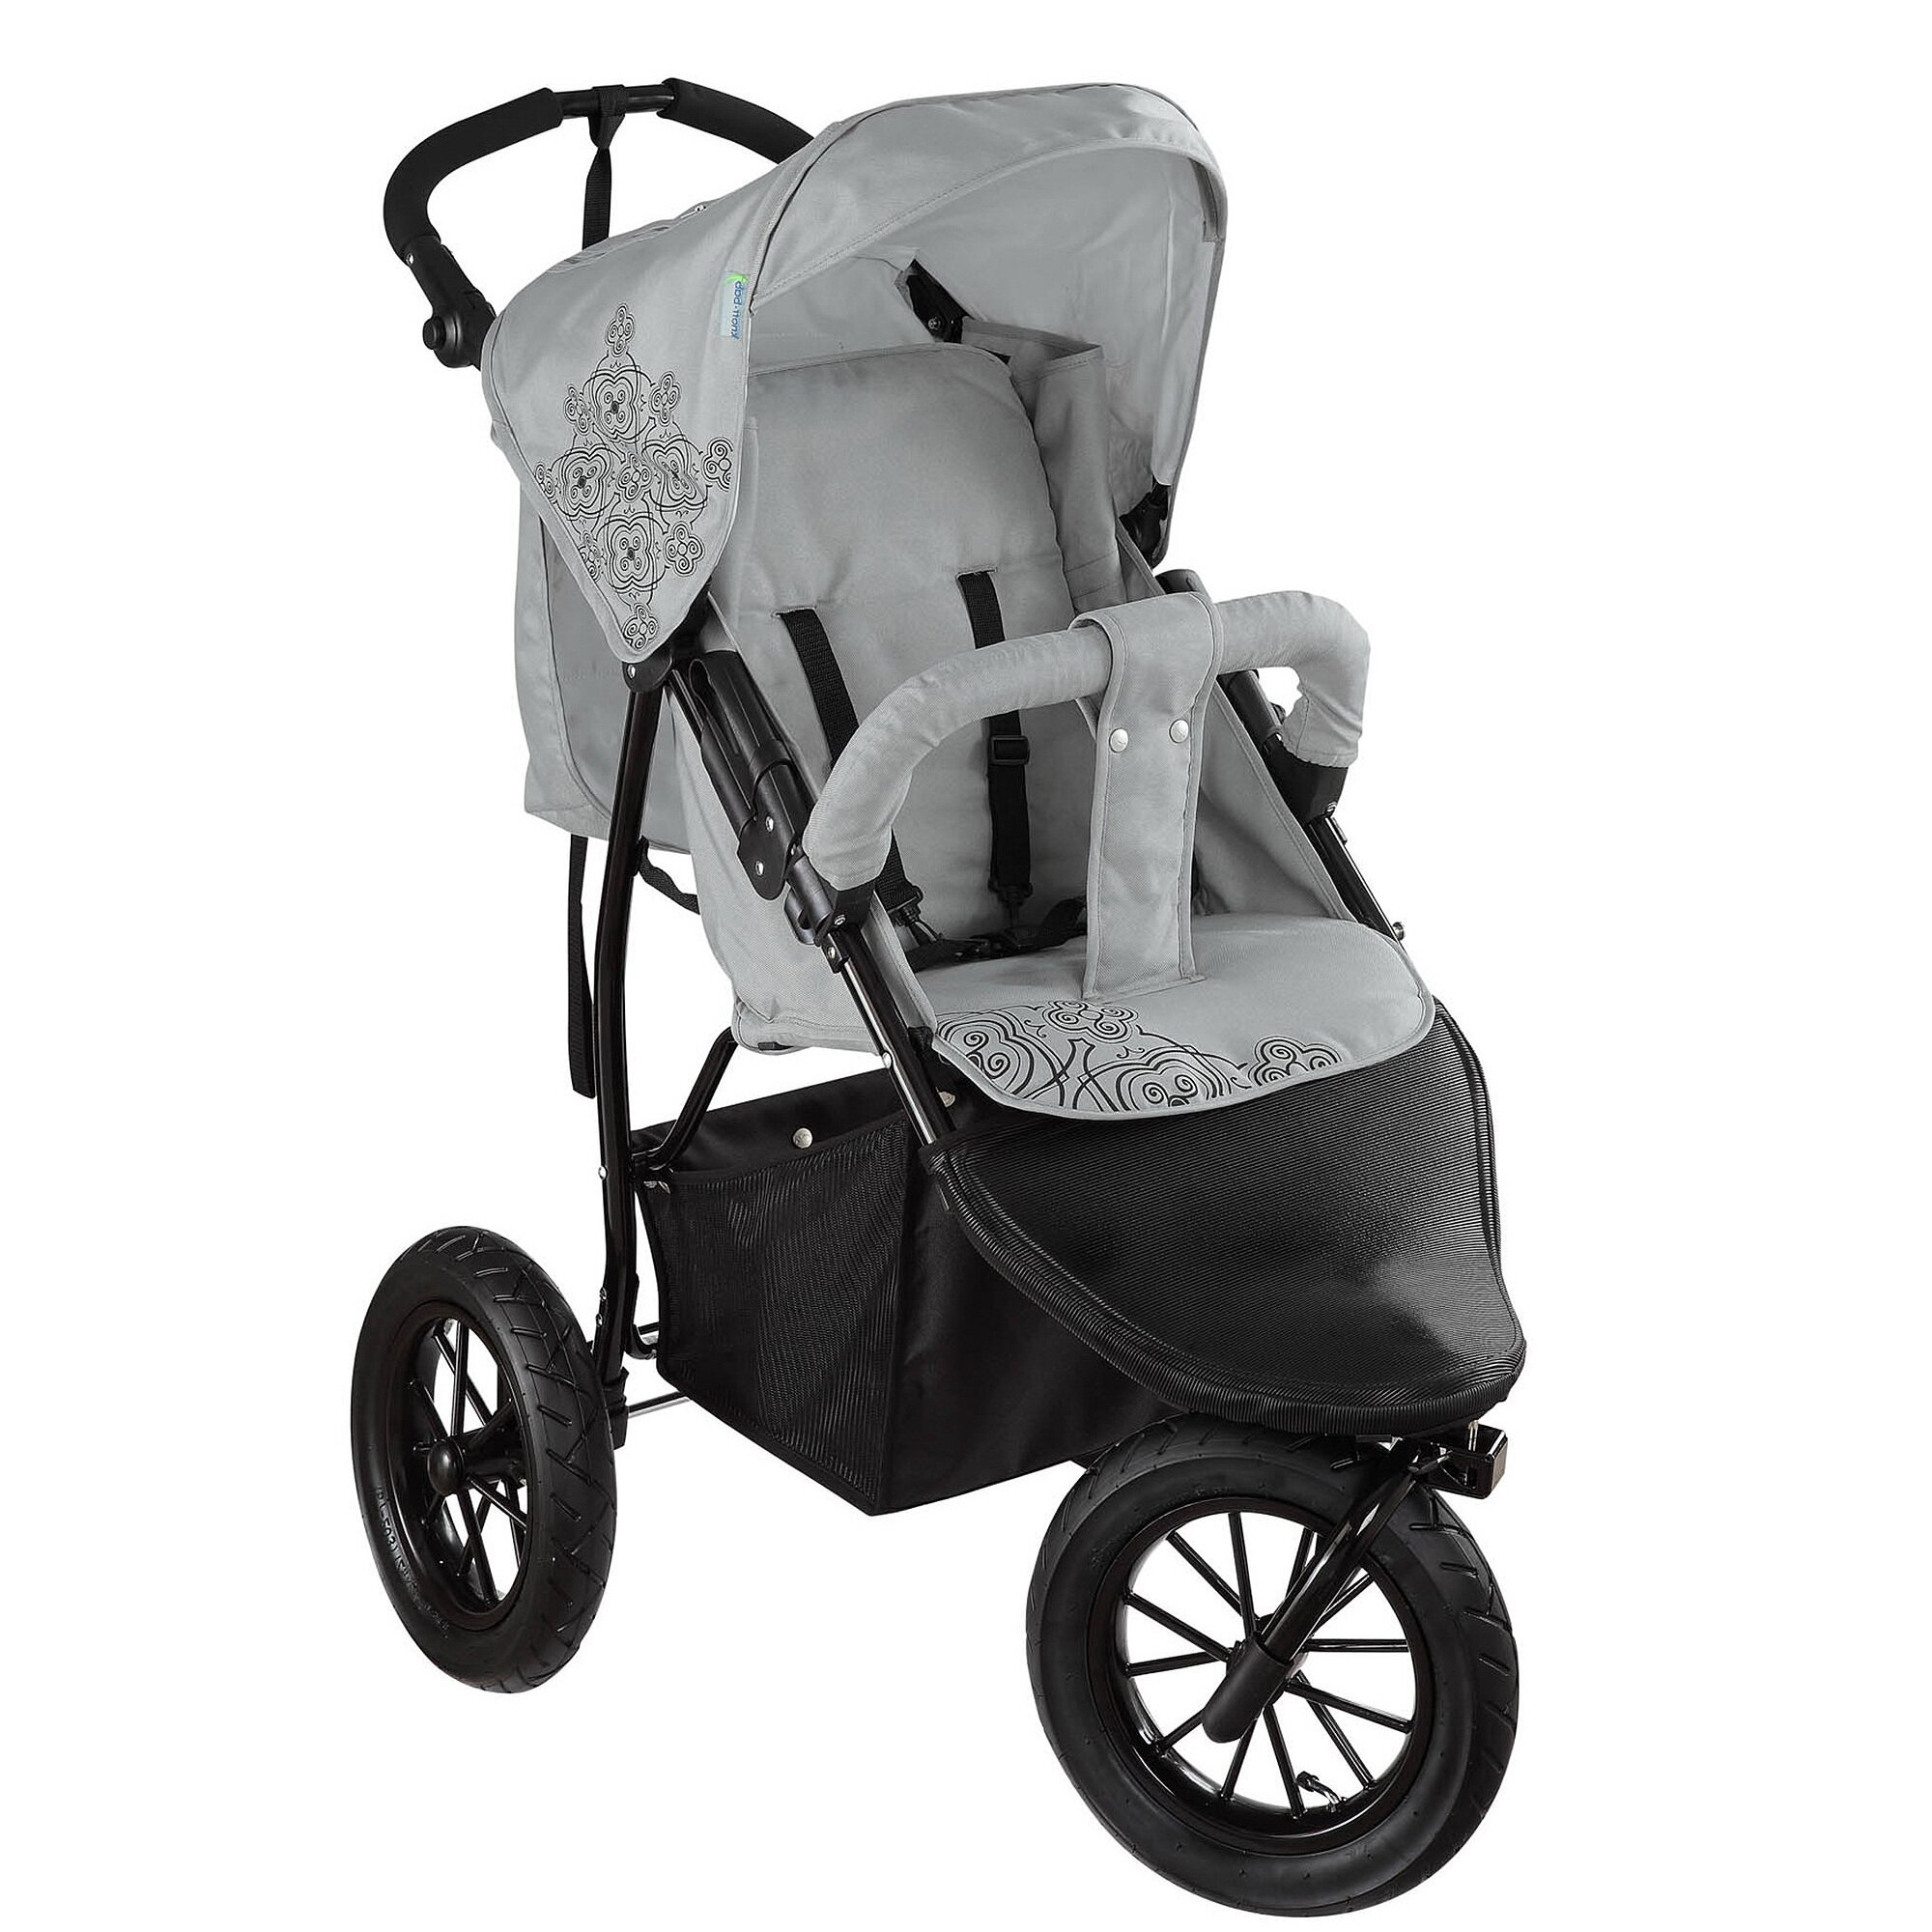 Knorr-Baby Joggy S Kinderwagen Sportwagen grau